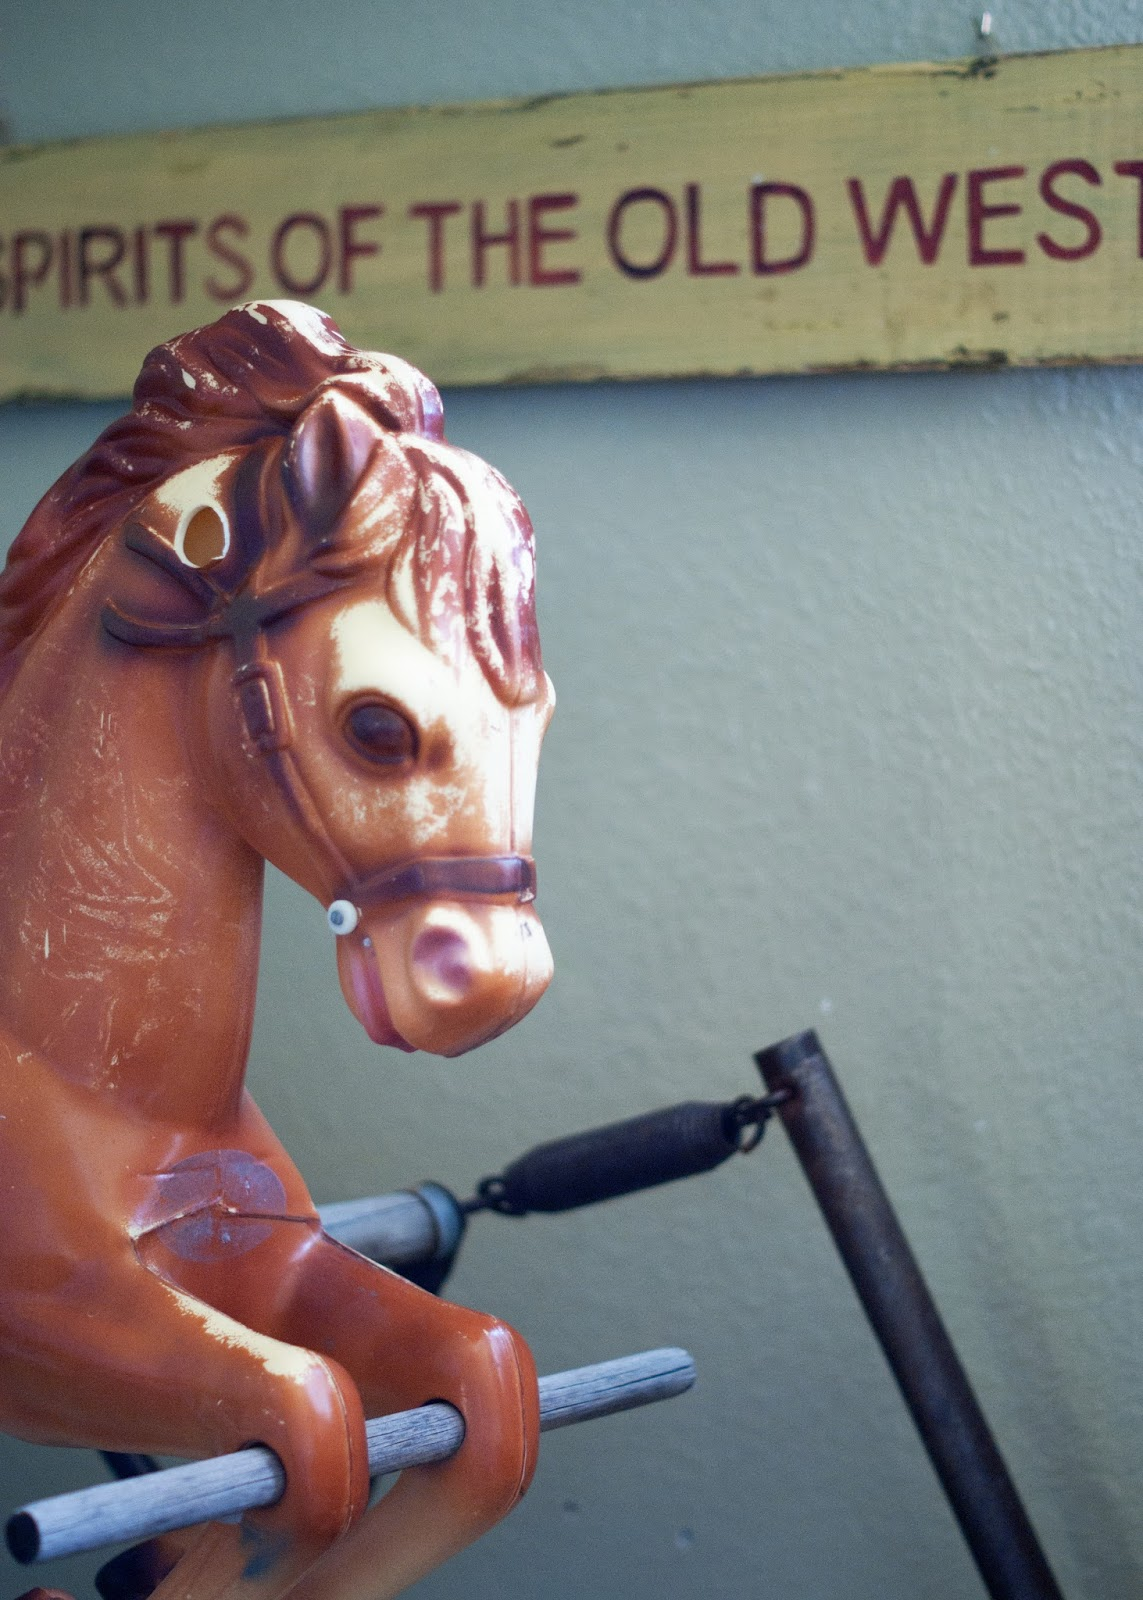 Vintage rocking horse and western sign